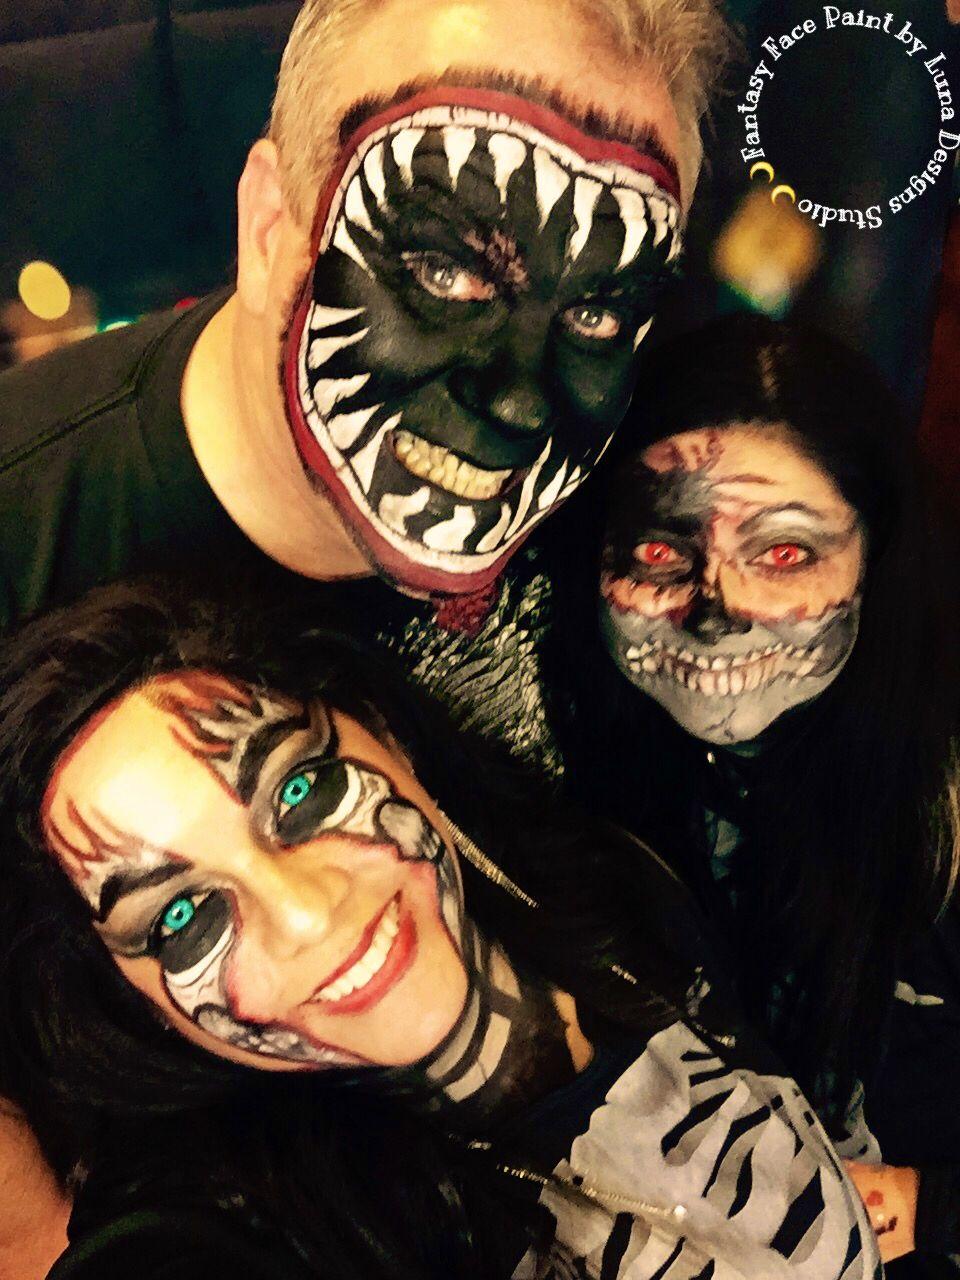 "Extreme Halloween Custom FacePaint By Luna Designs Studio ""Let Luna Create A Beautiful Work of Art For You or On You"" #LoveMyLuna #halloween #halloween2015 #halloweenmskeup"